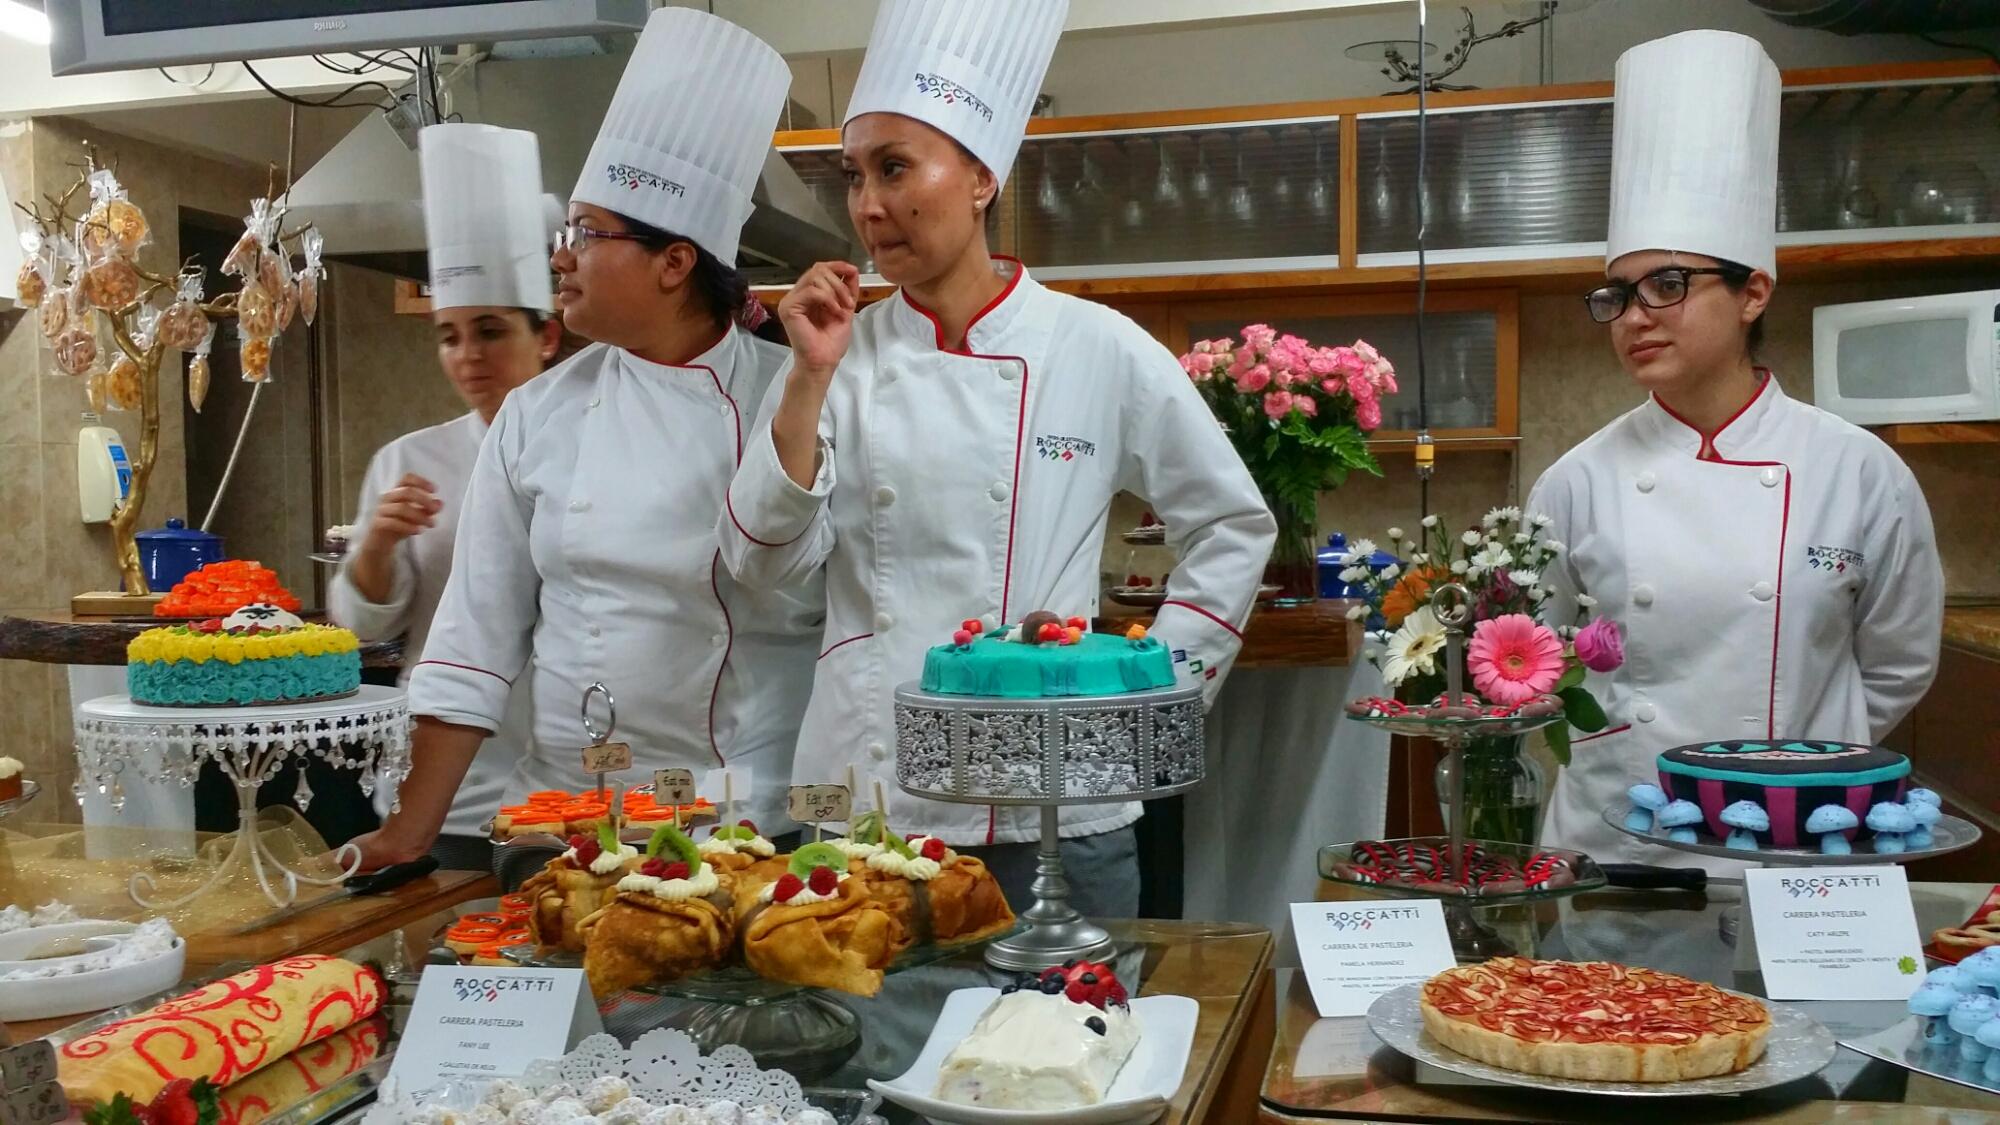 Hoy as celebra roccatti cecroccatti su fin de curso para for Articulos para chef